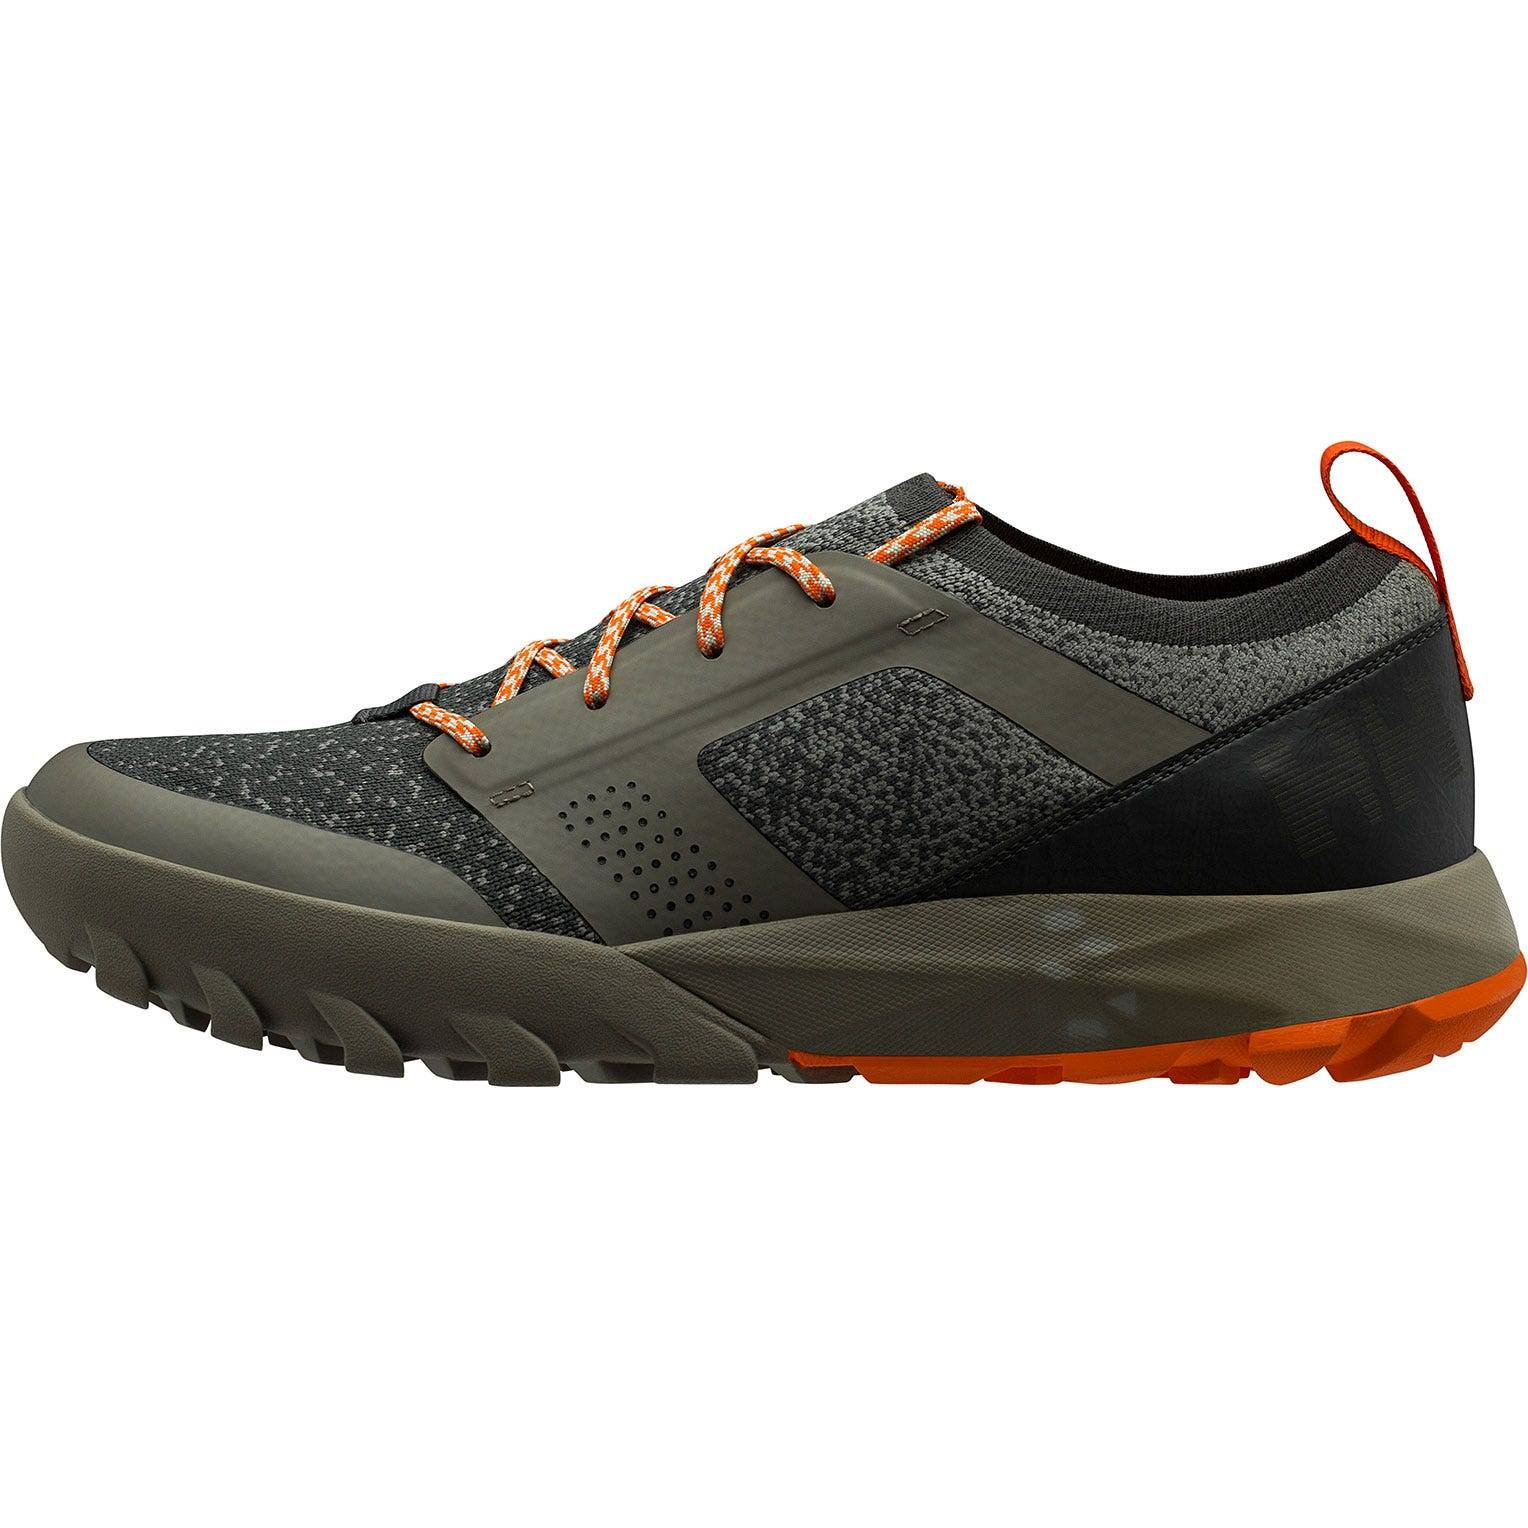 Helly Hansen Loke Dash Mens Hiking Boot Black 40.5/7.5